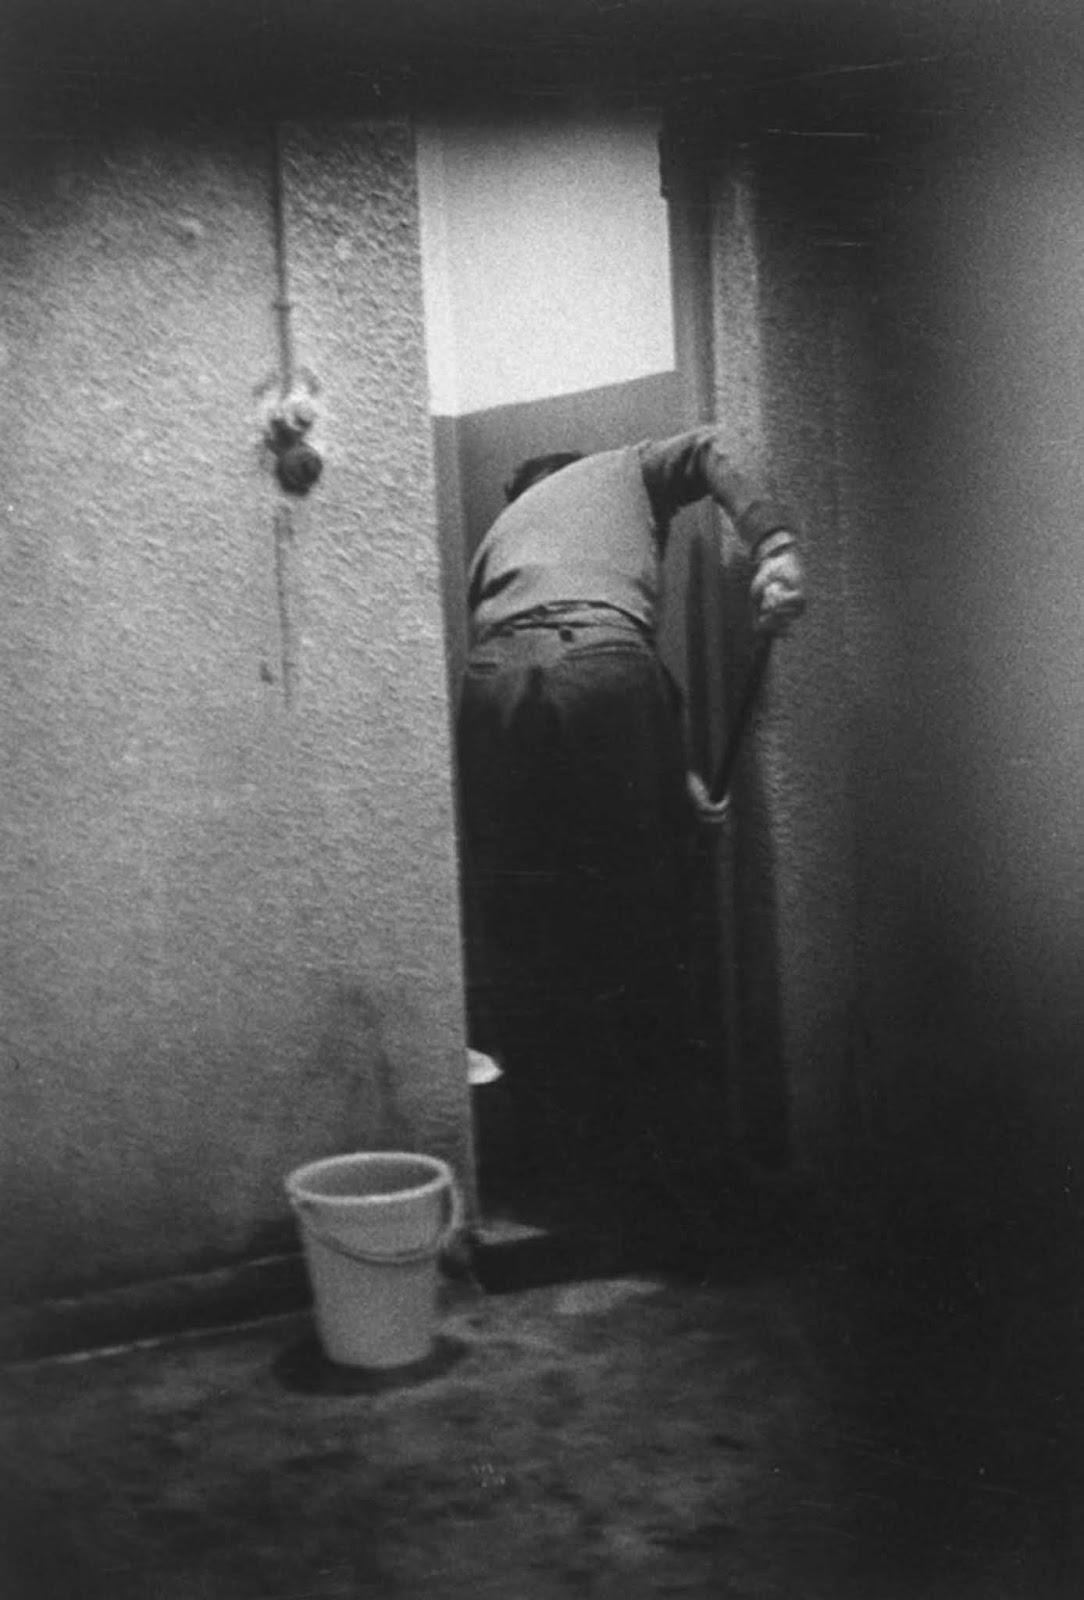 Doing chores, Eichmann mopped the bathroom floor in his jail near Haifa.